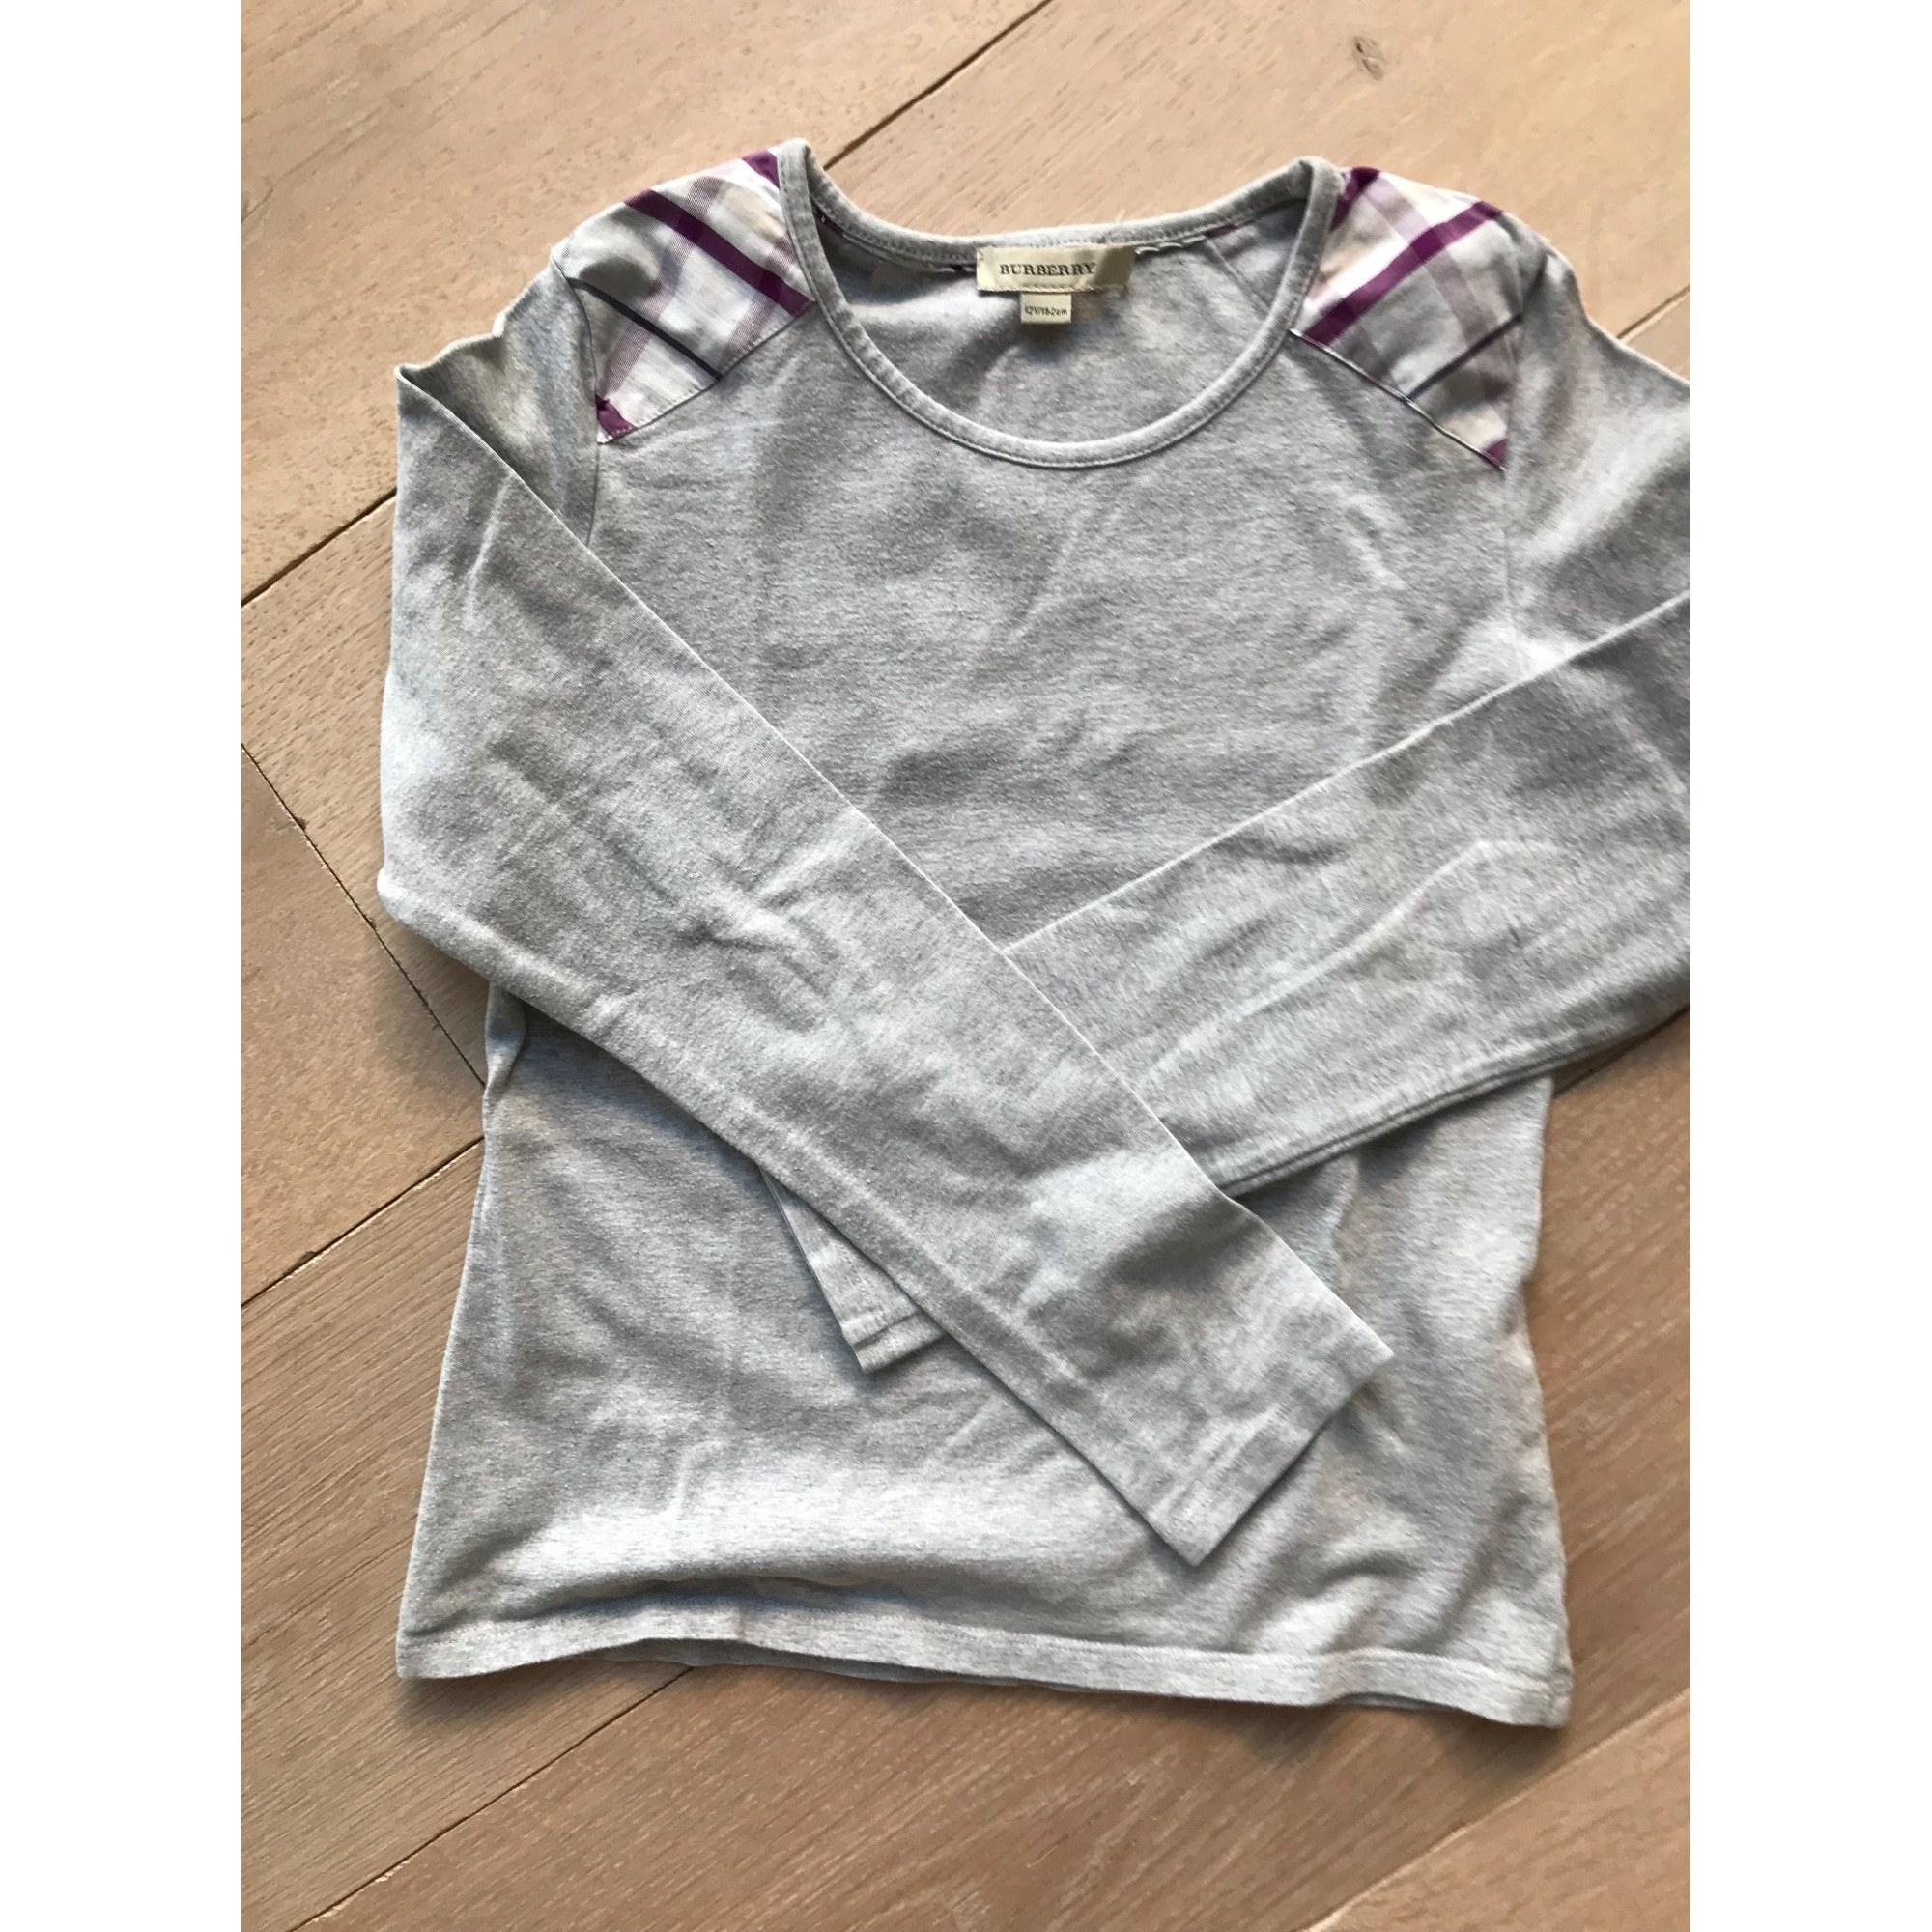 Top, Tee-shirt BURBERRY Gris, anthracite